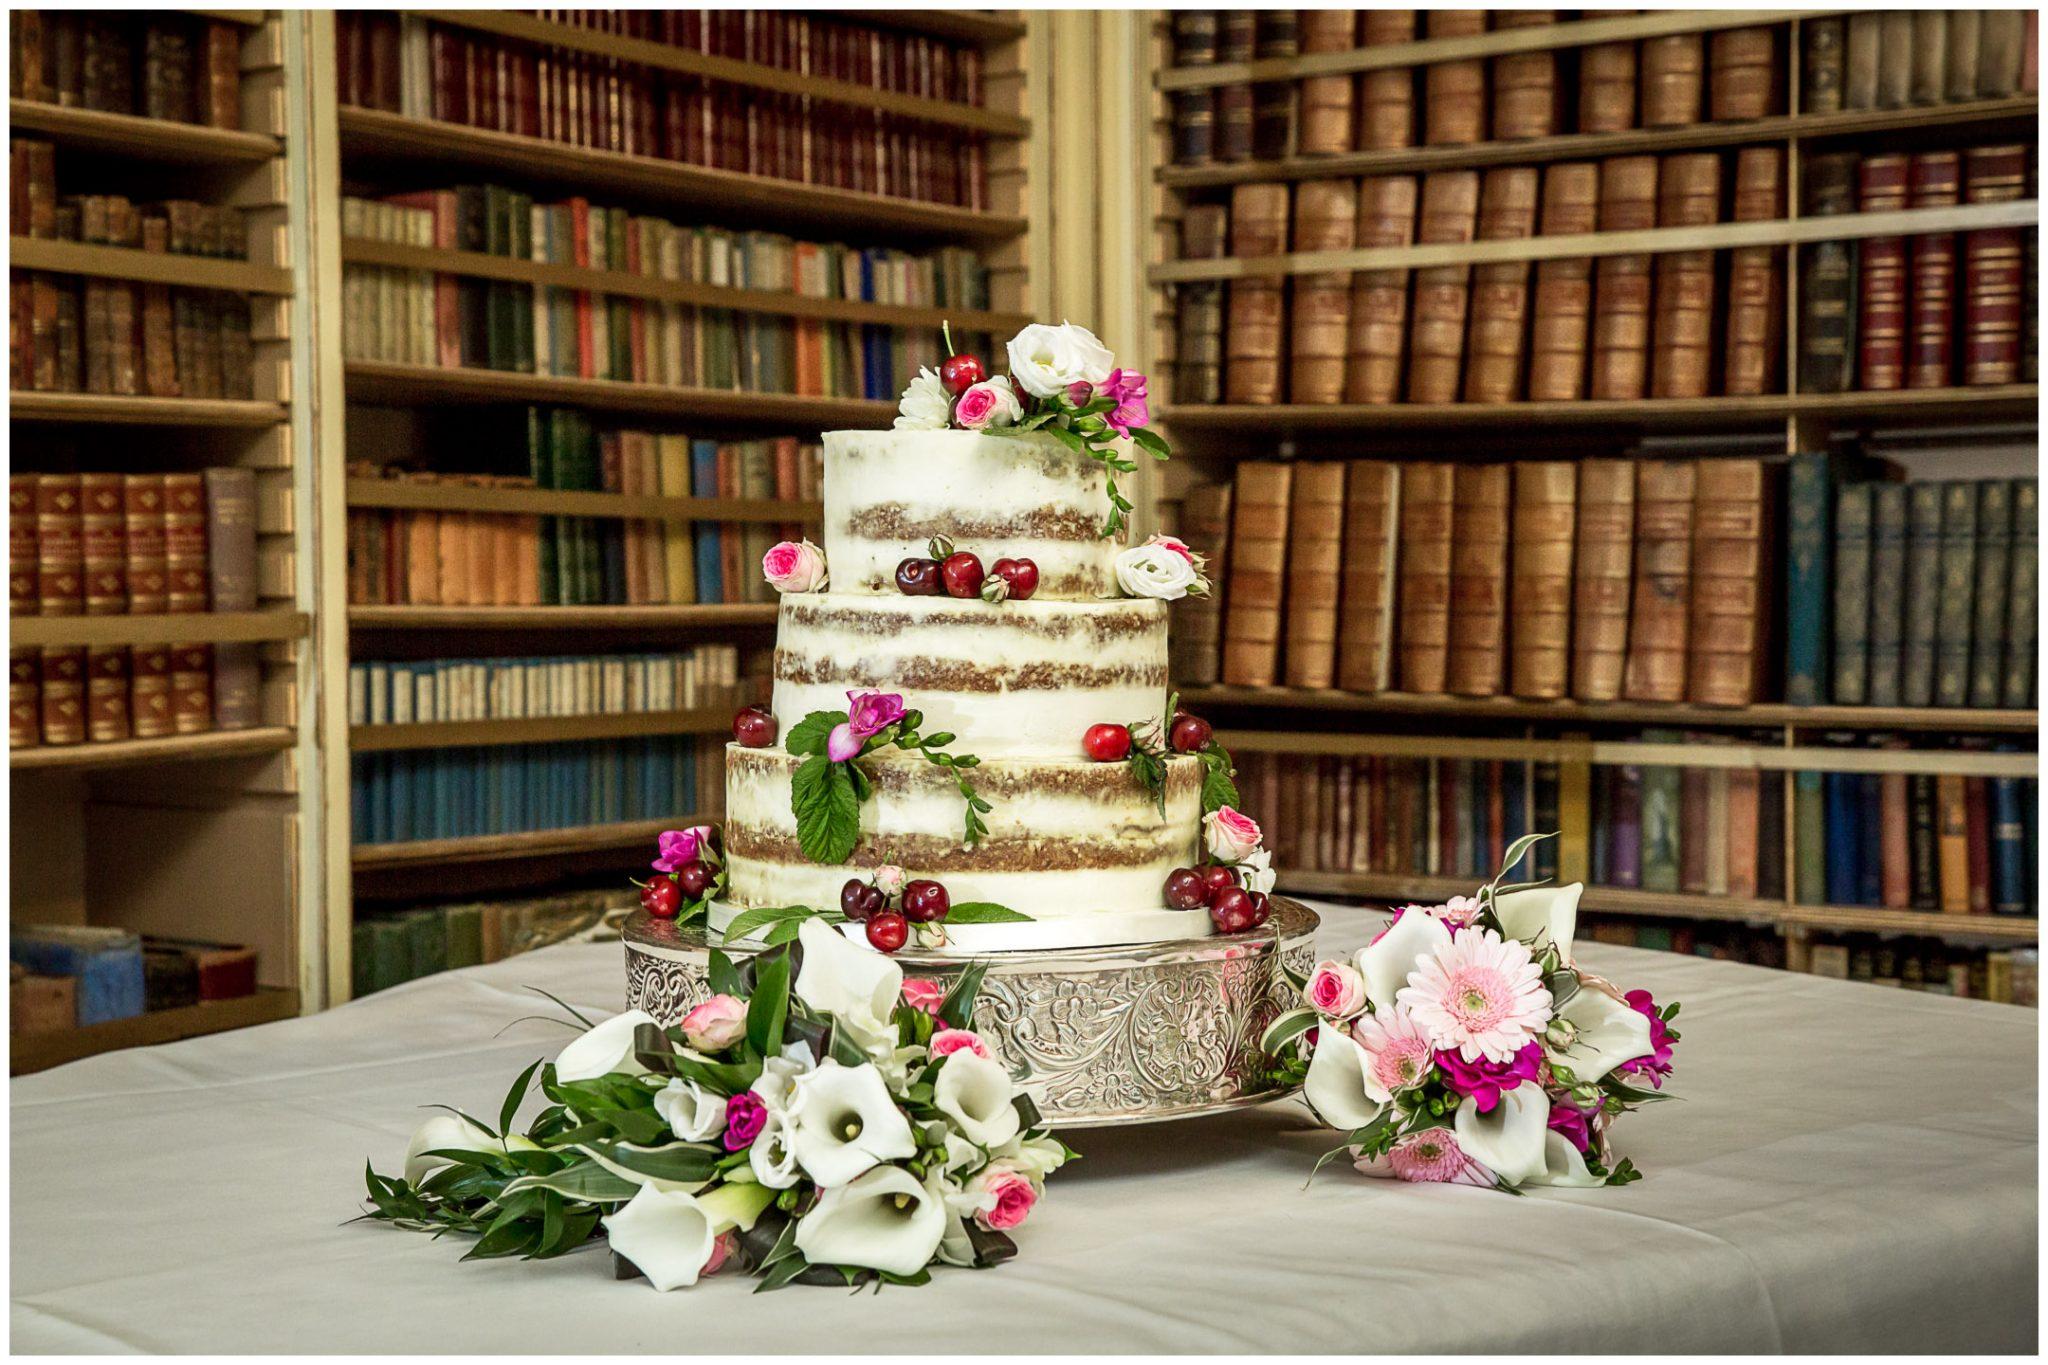 Avington Park wedding photography wedding cake in library